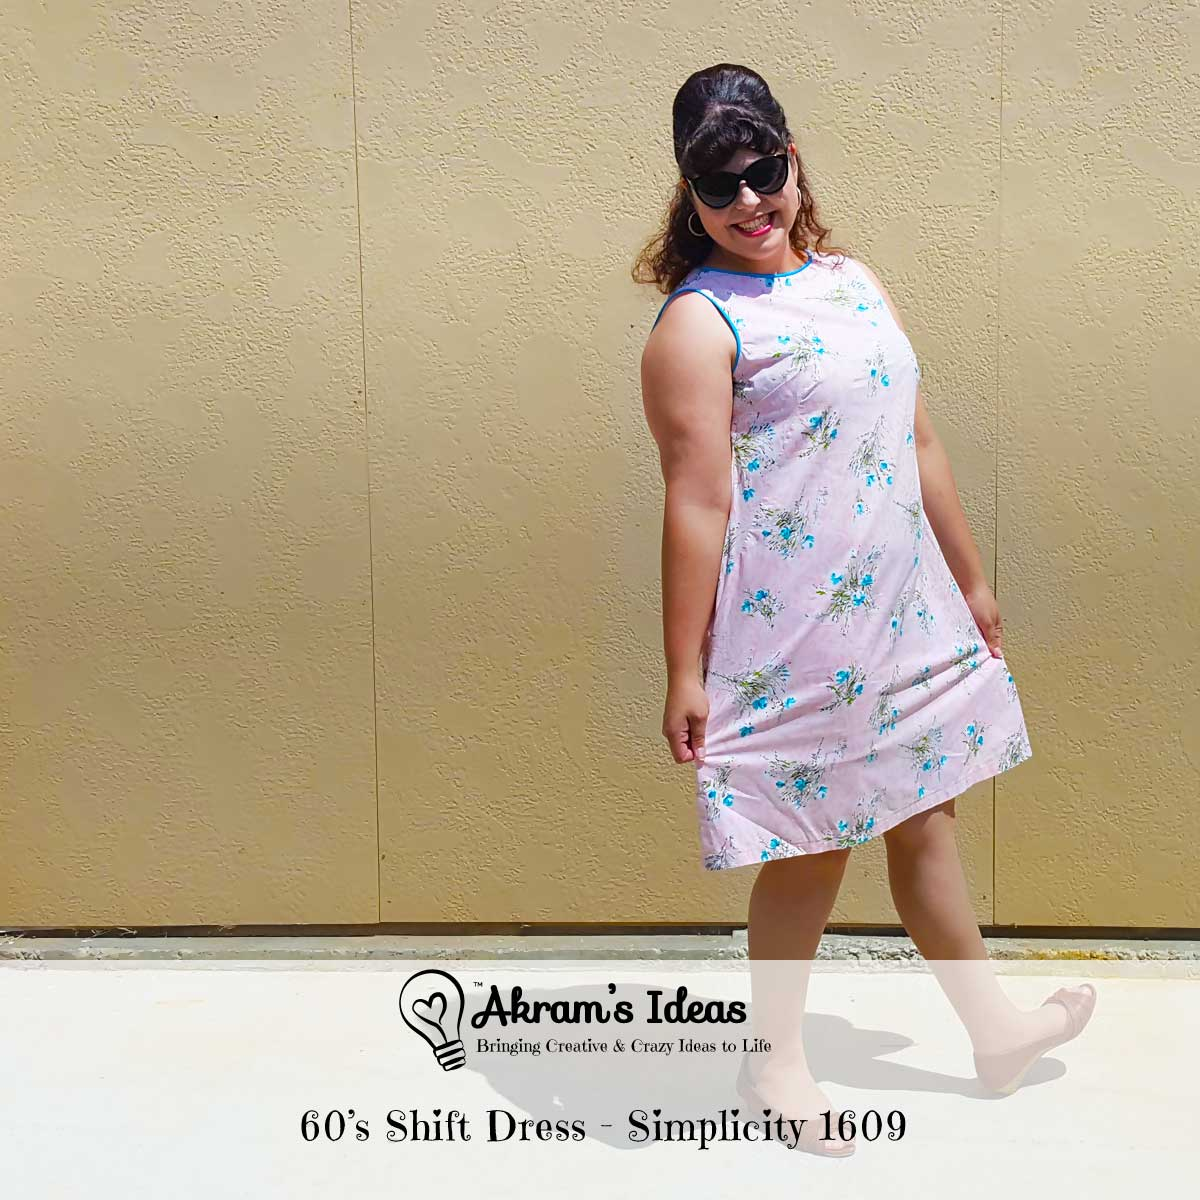 60's Shift Dress - Simplicity 1609